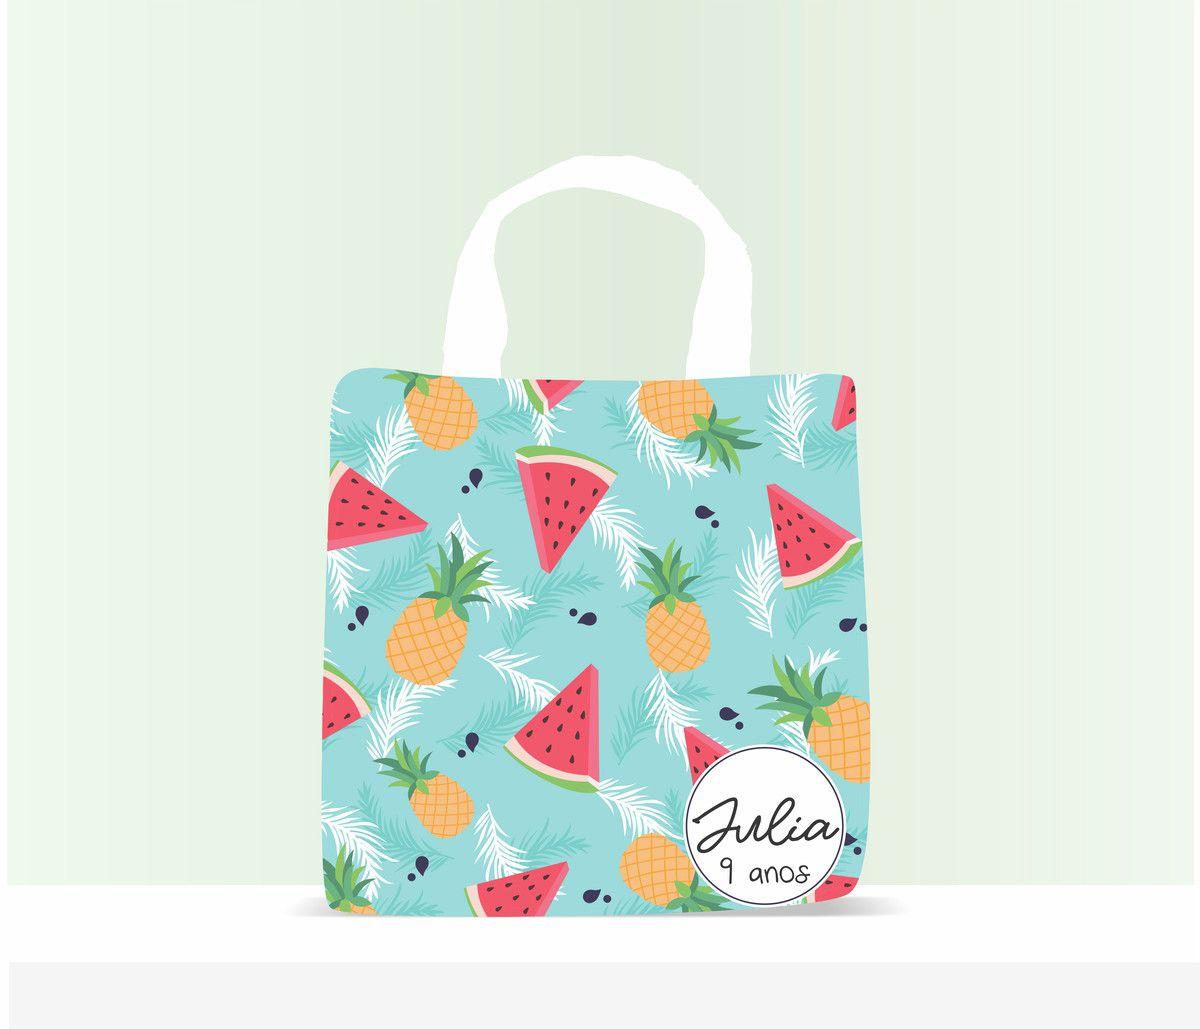 Sacola Ecobag Personalizada Infantil Tropical Azul